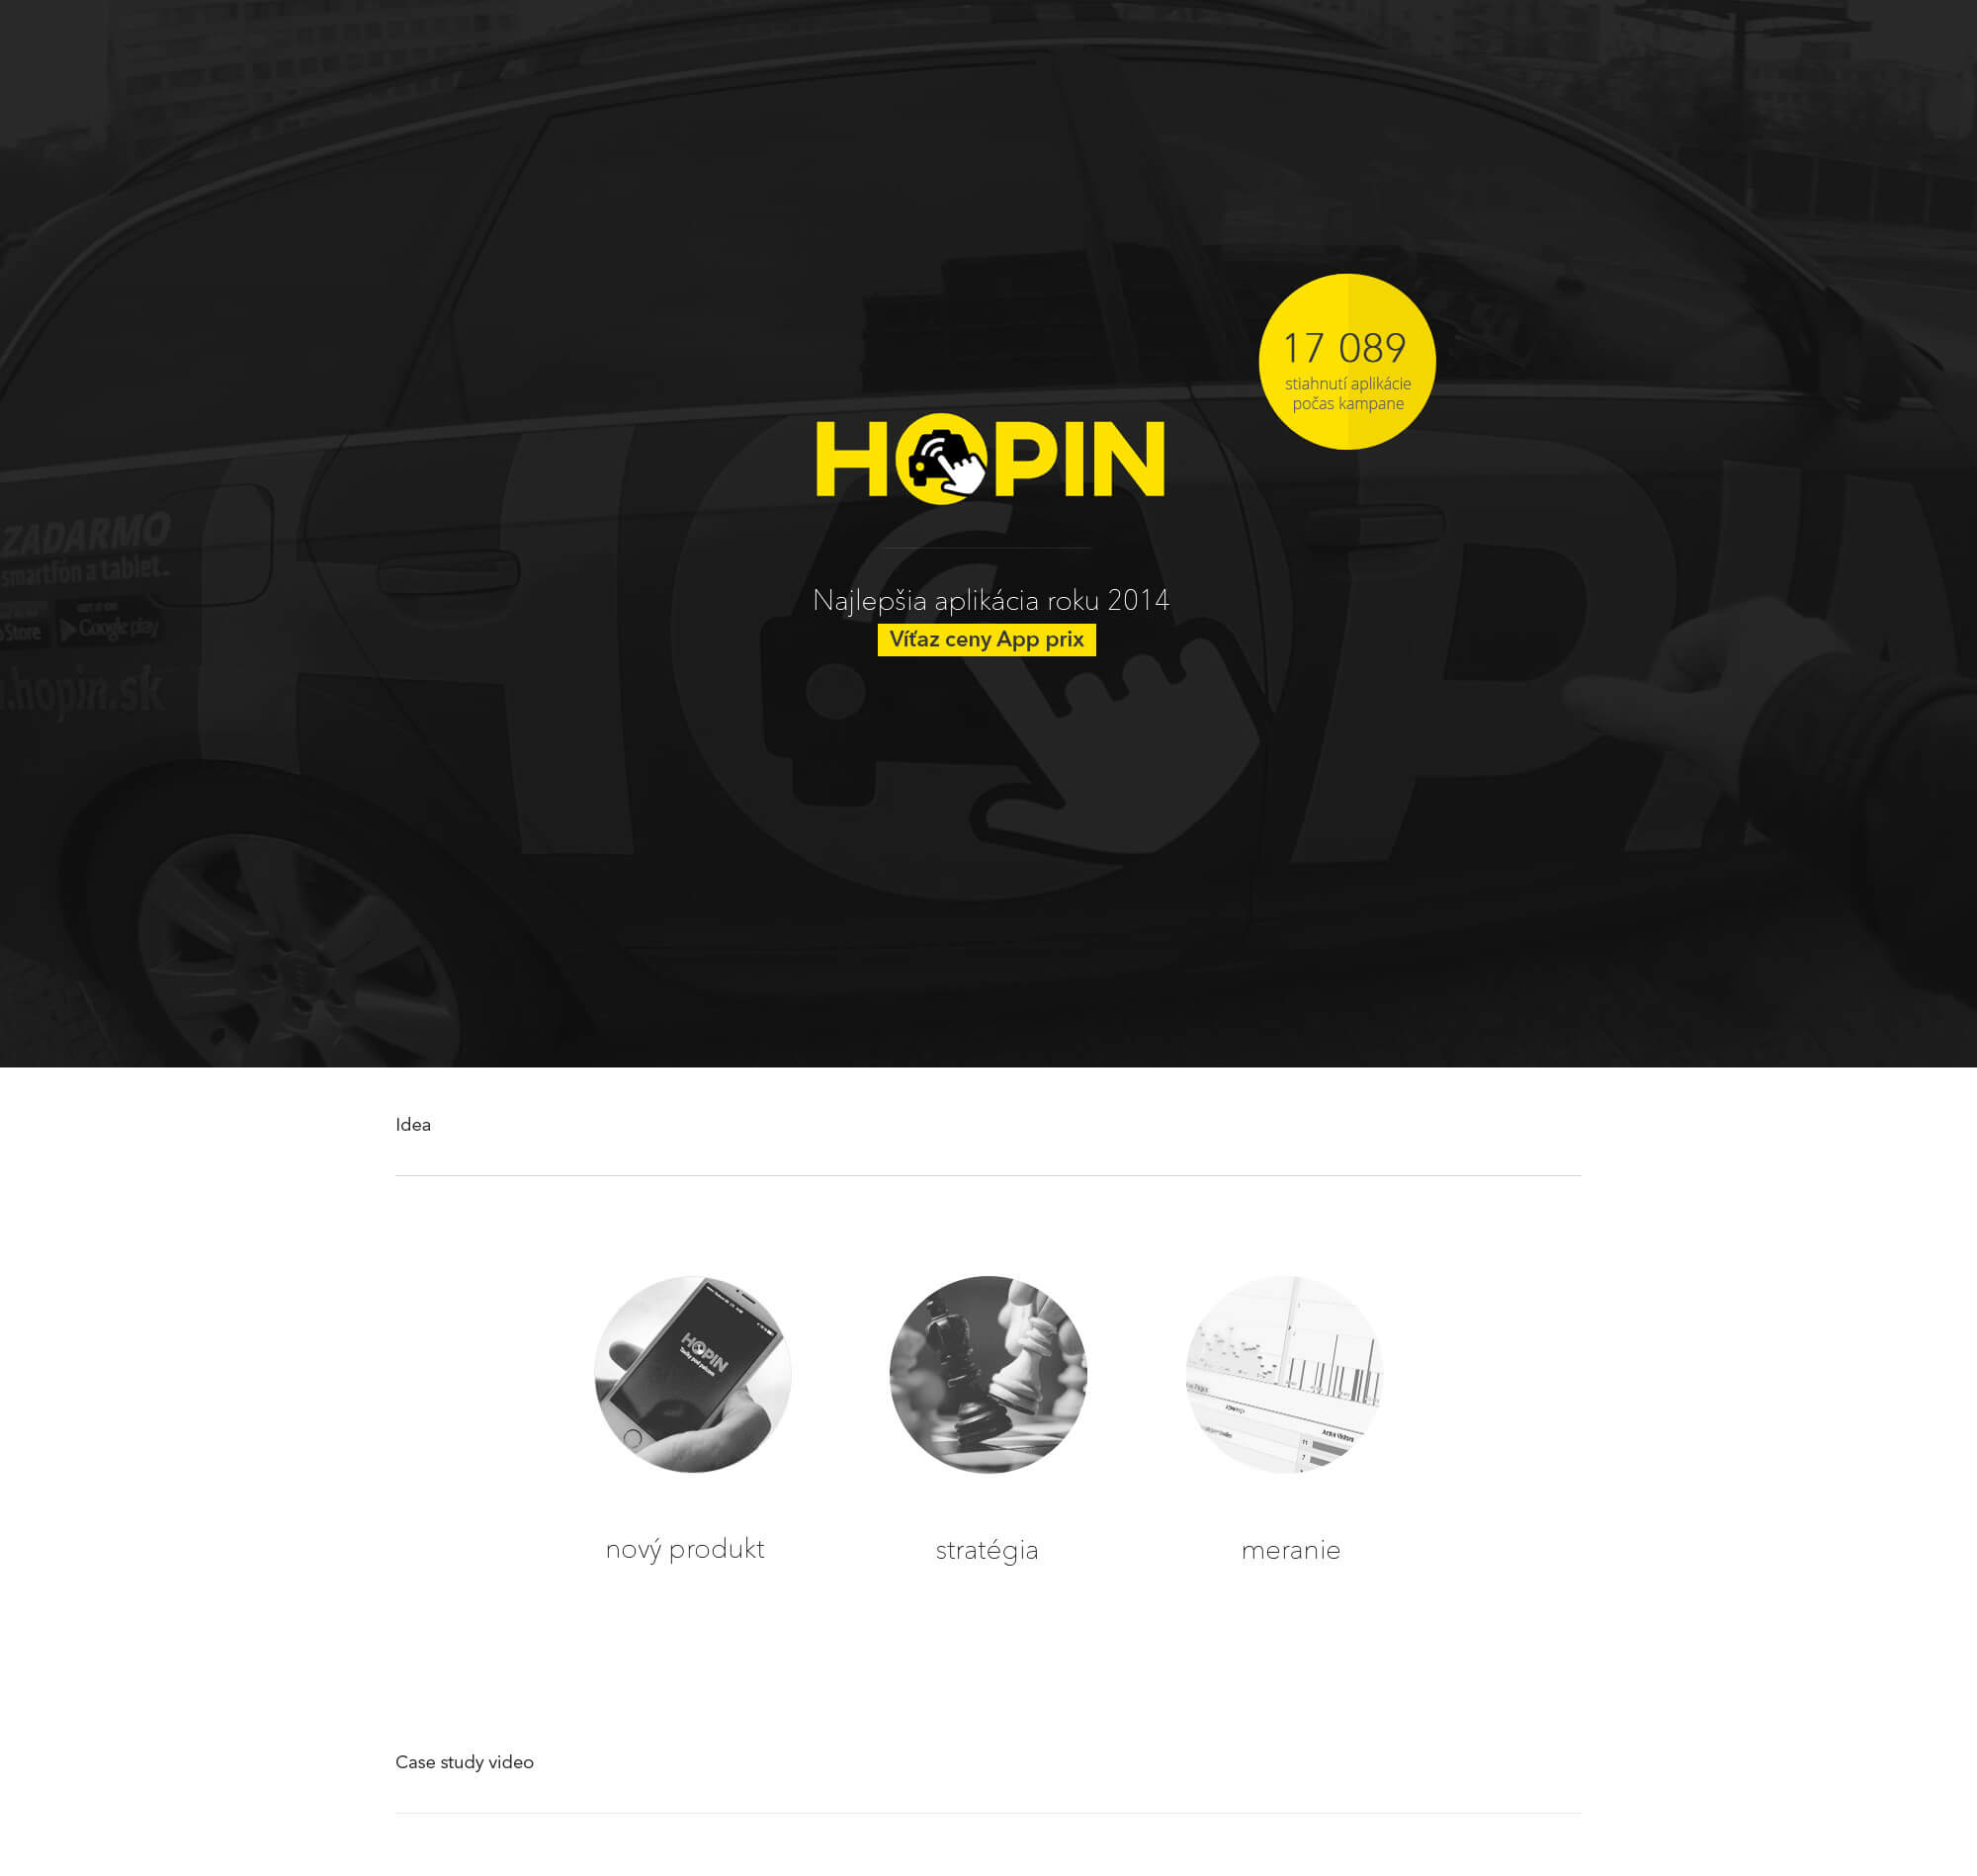 hopin_1(1)